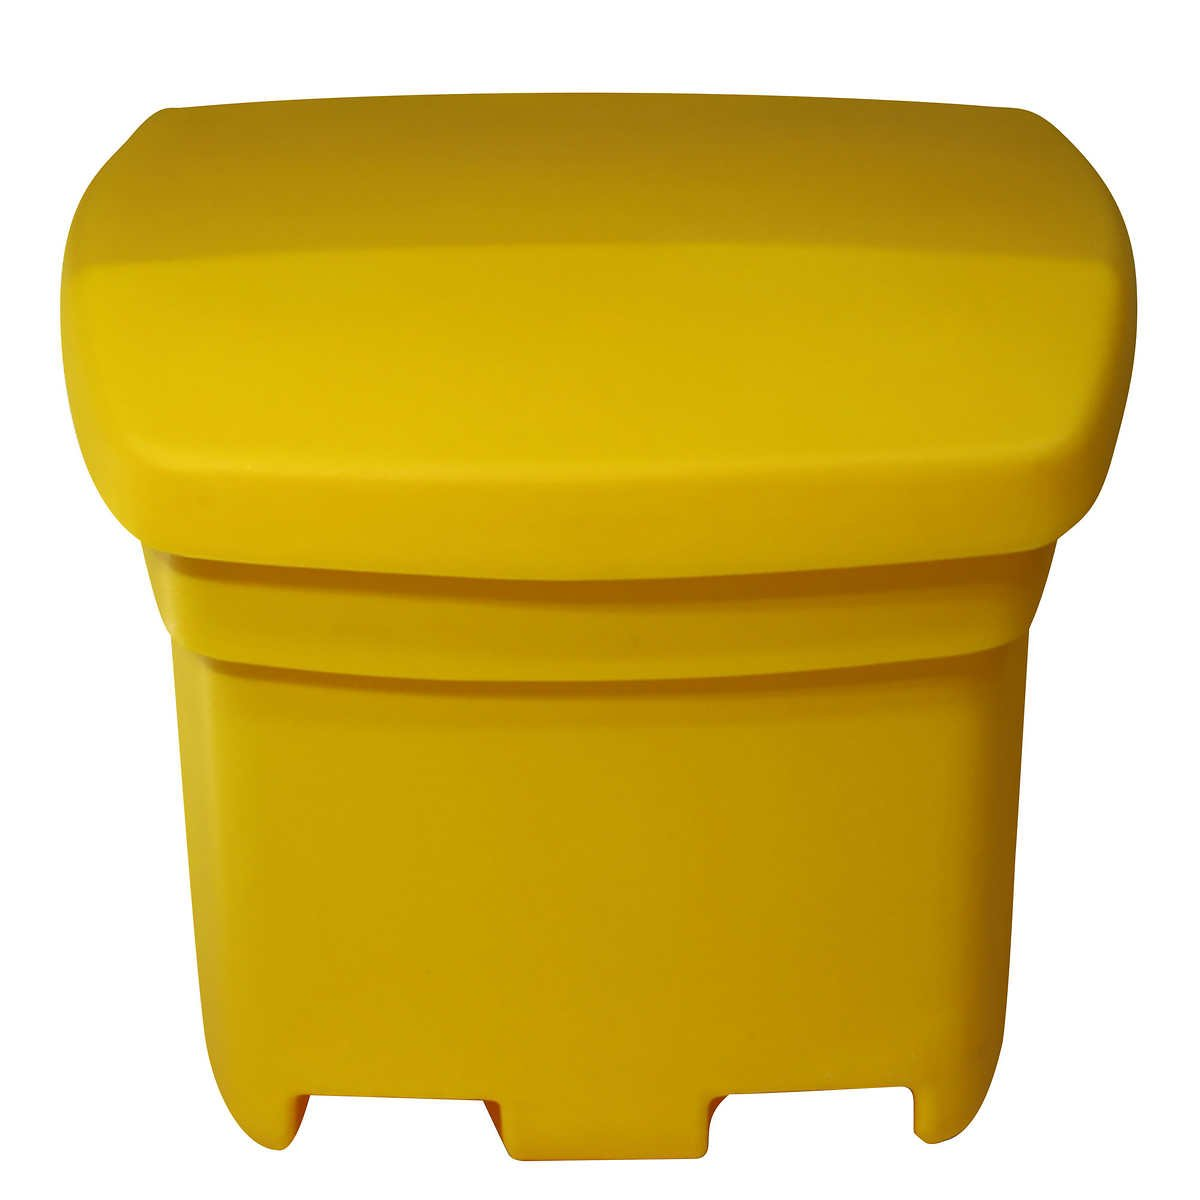 FCMP Outdoor Sand and Salt Storage Bin Yellow